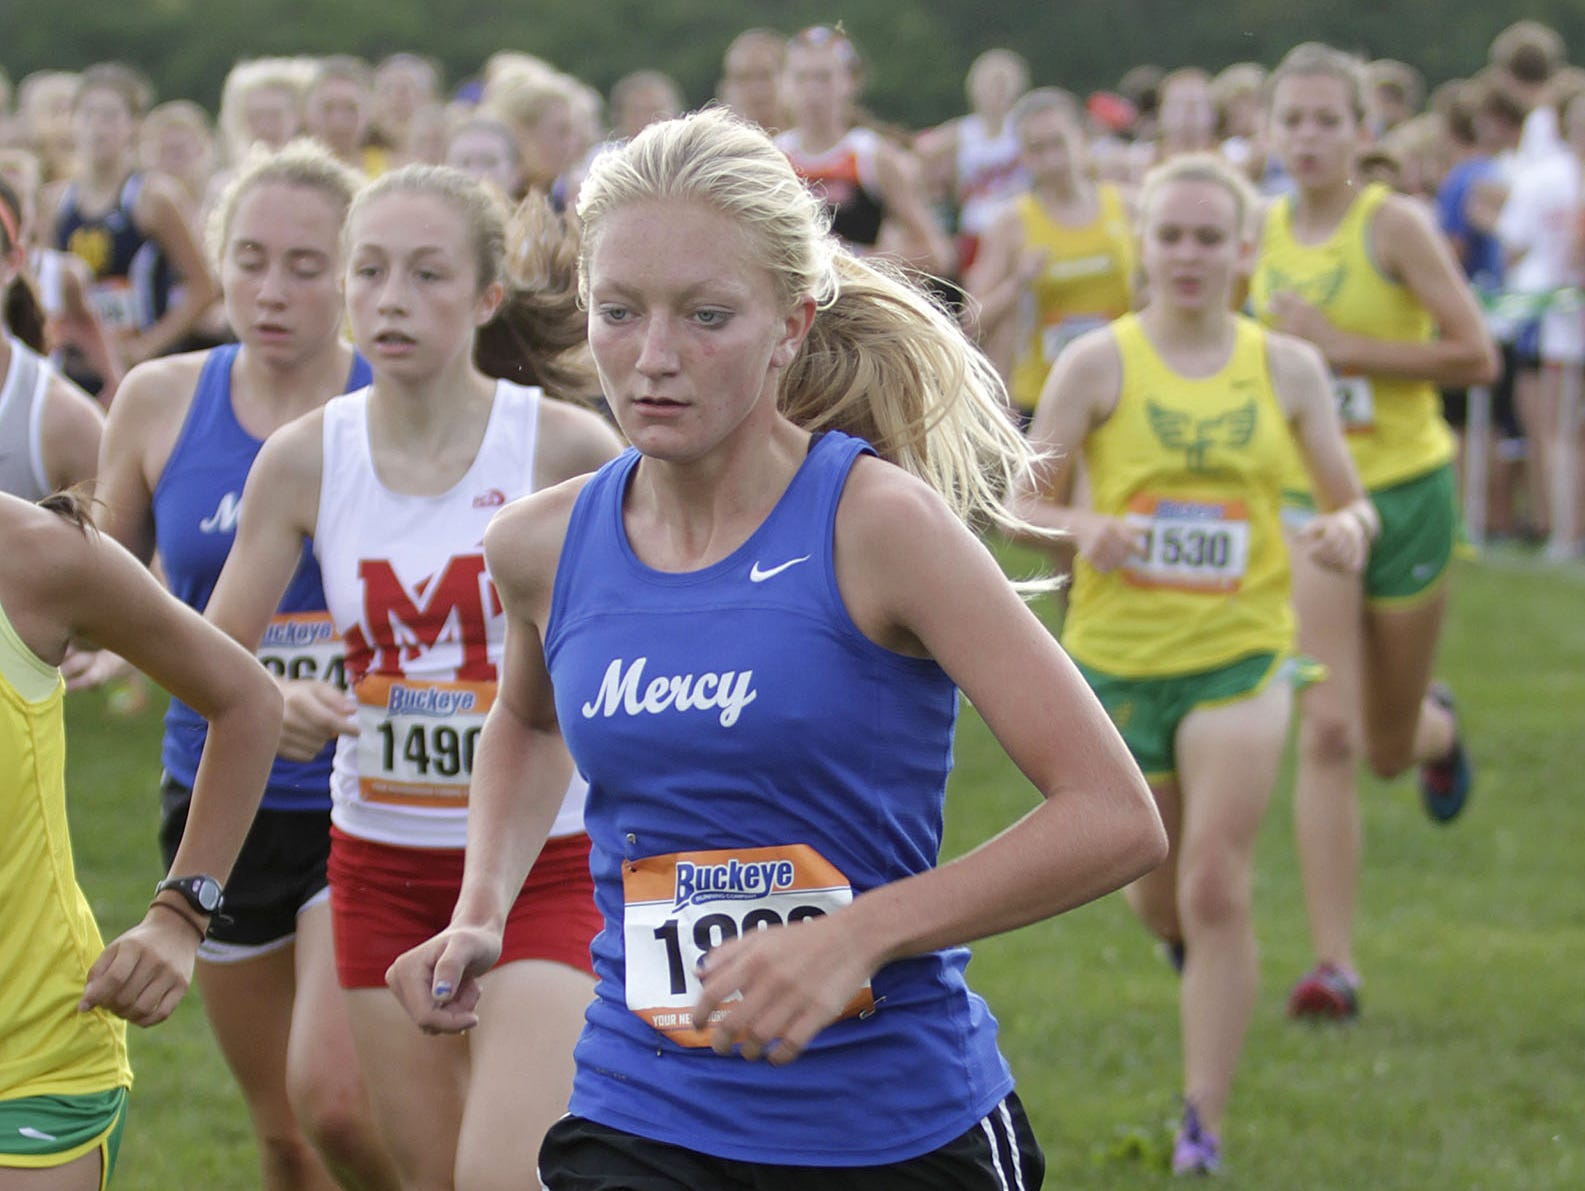 Mercy's Megan Zeinner runs at the Mason cross country invite this past season.